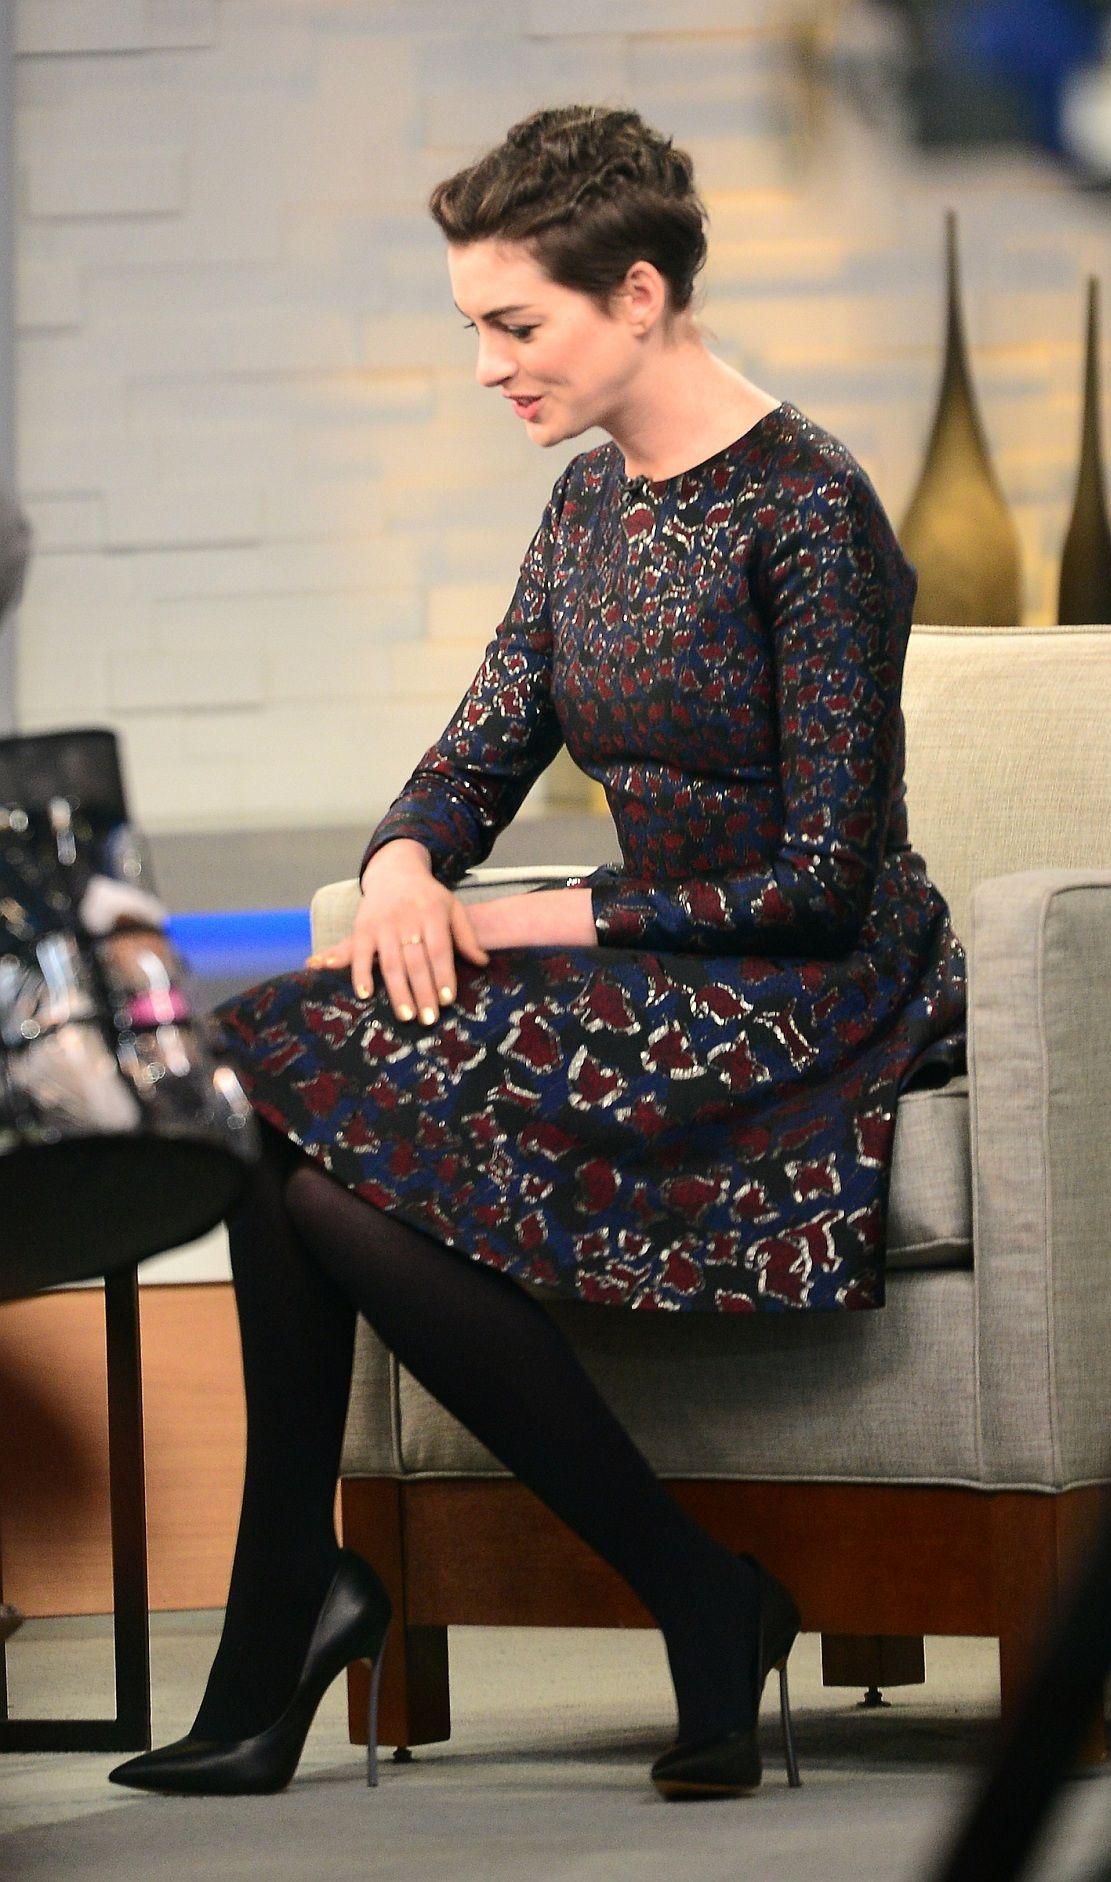 Anne Hathaway in Leggings Out in Brooklyn - August 2014